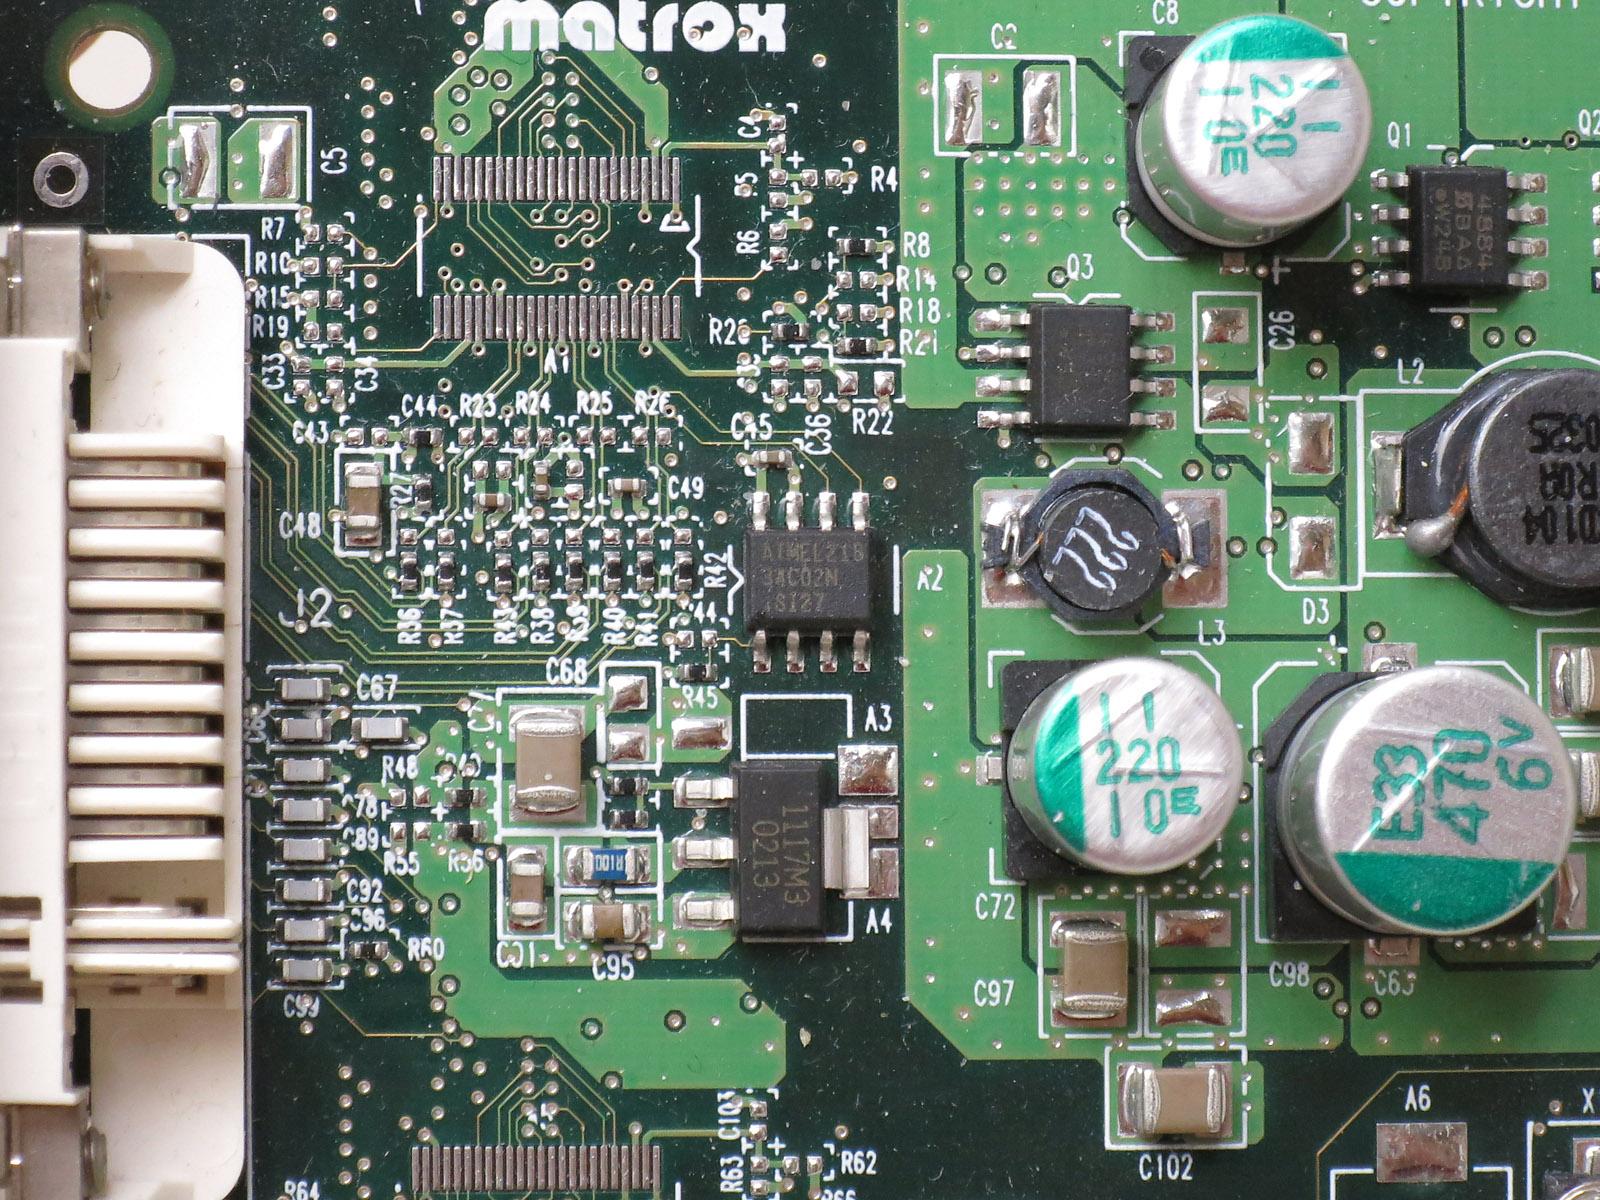 VGA BIOSはAtmel製のシリアルEEPROM「34C02N」に保存されていると思われる